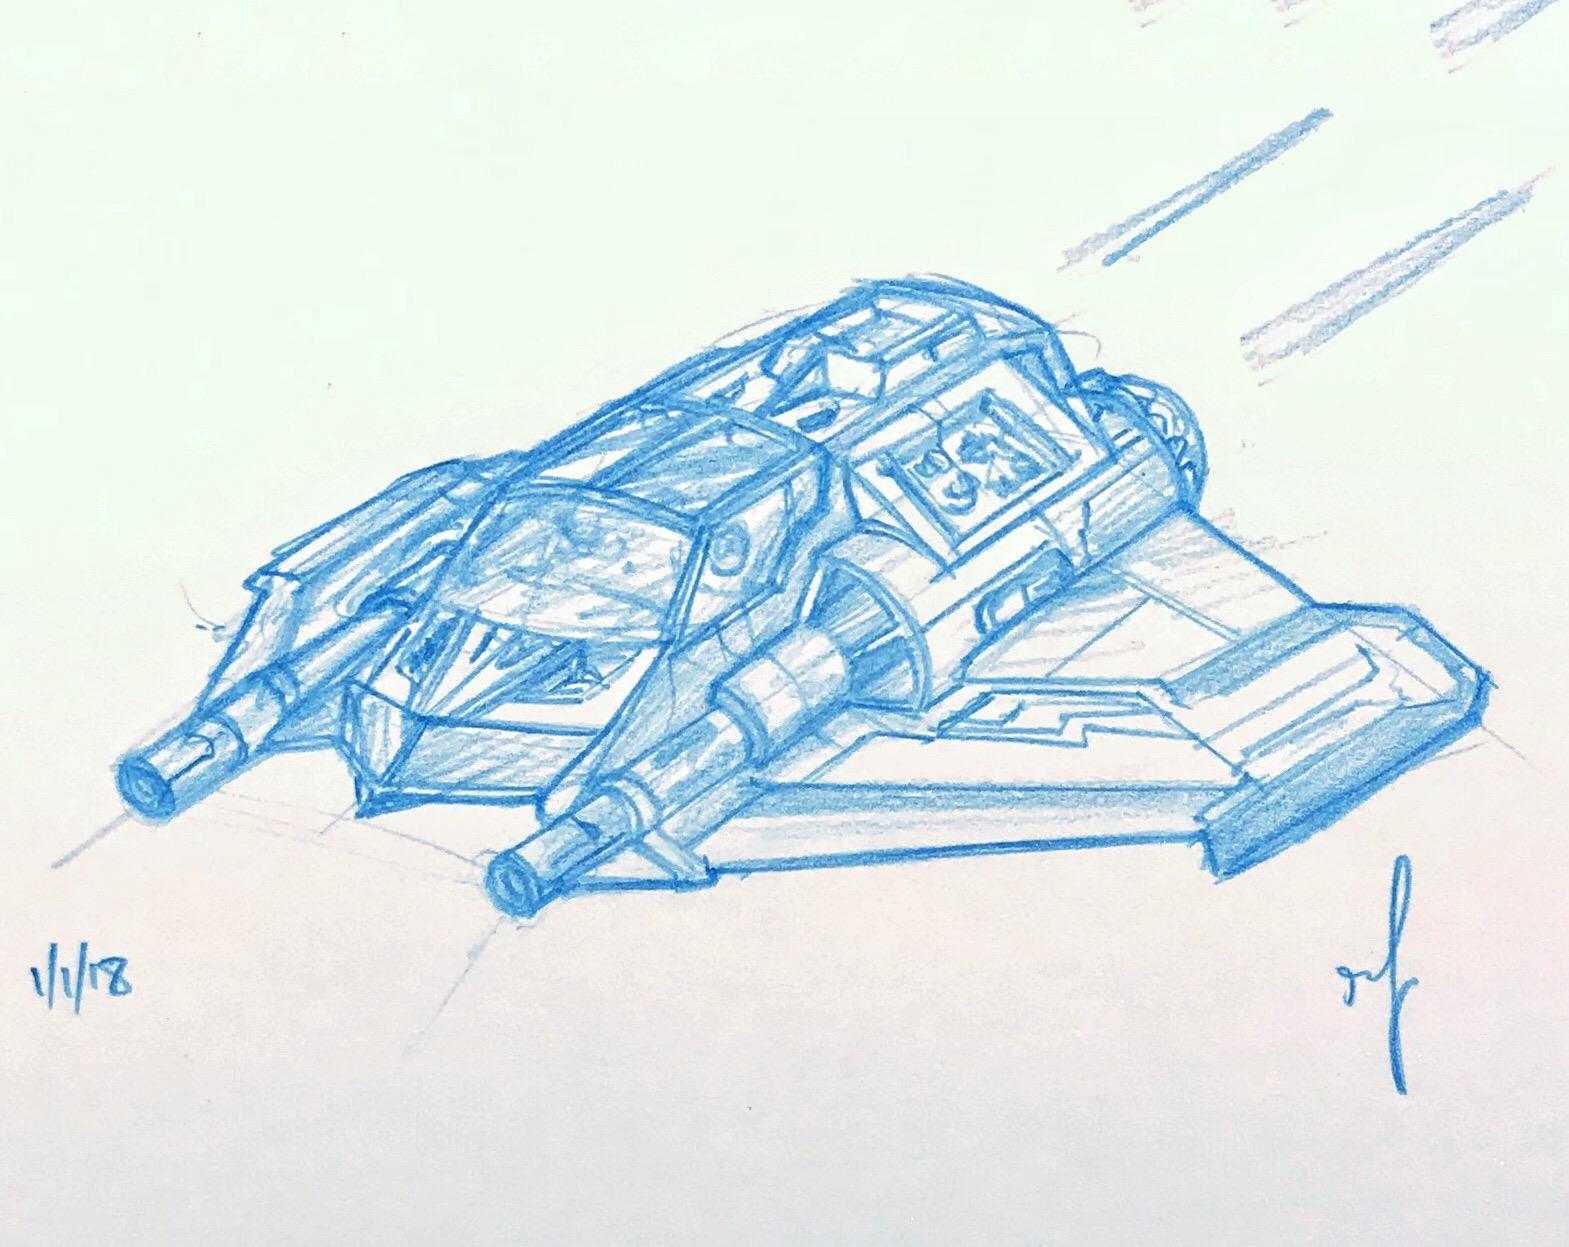 BUBO Sketch